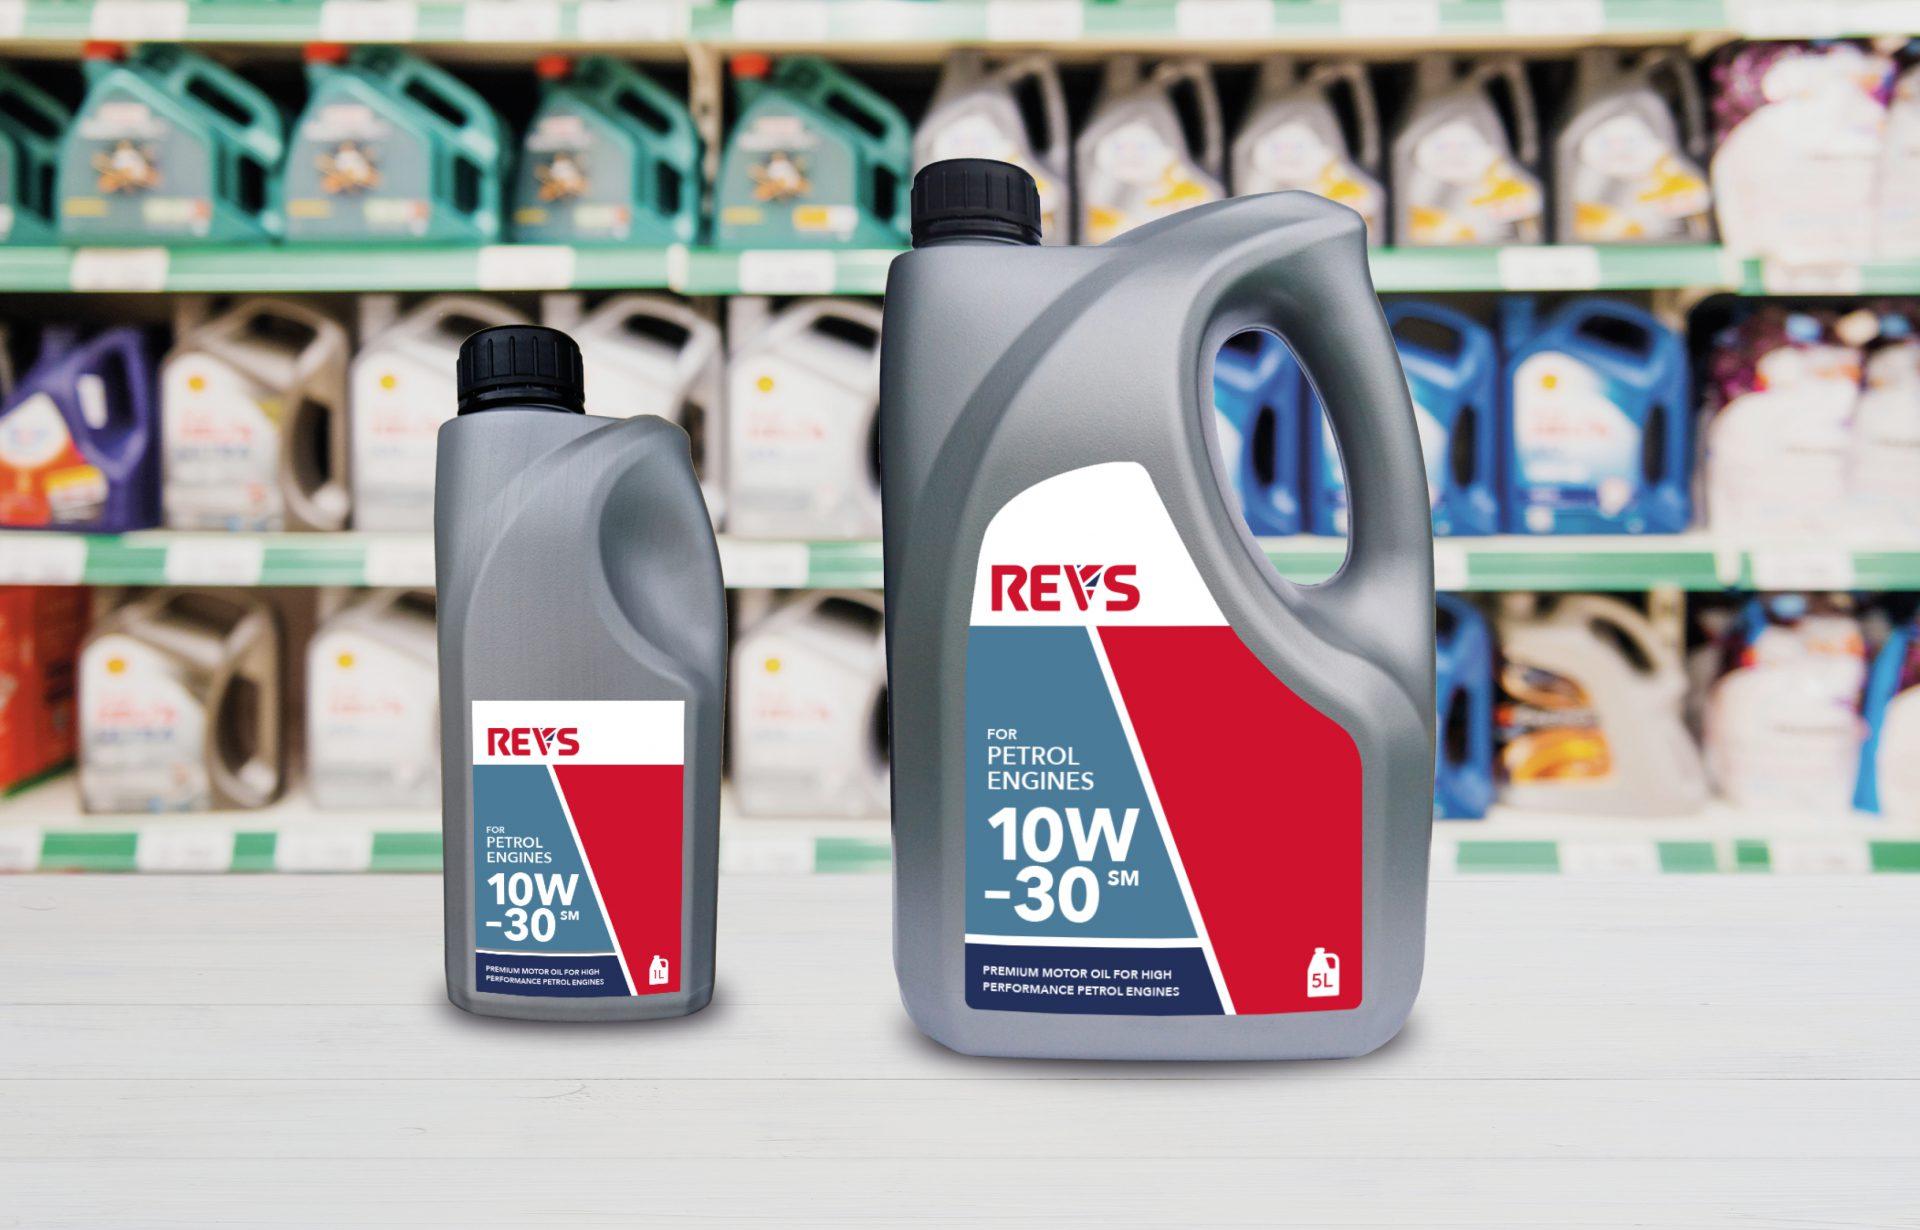 REVS packaging design by branding agency, Design Inc